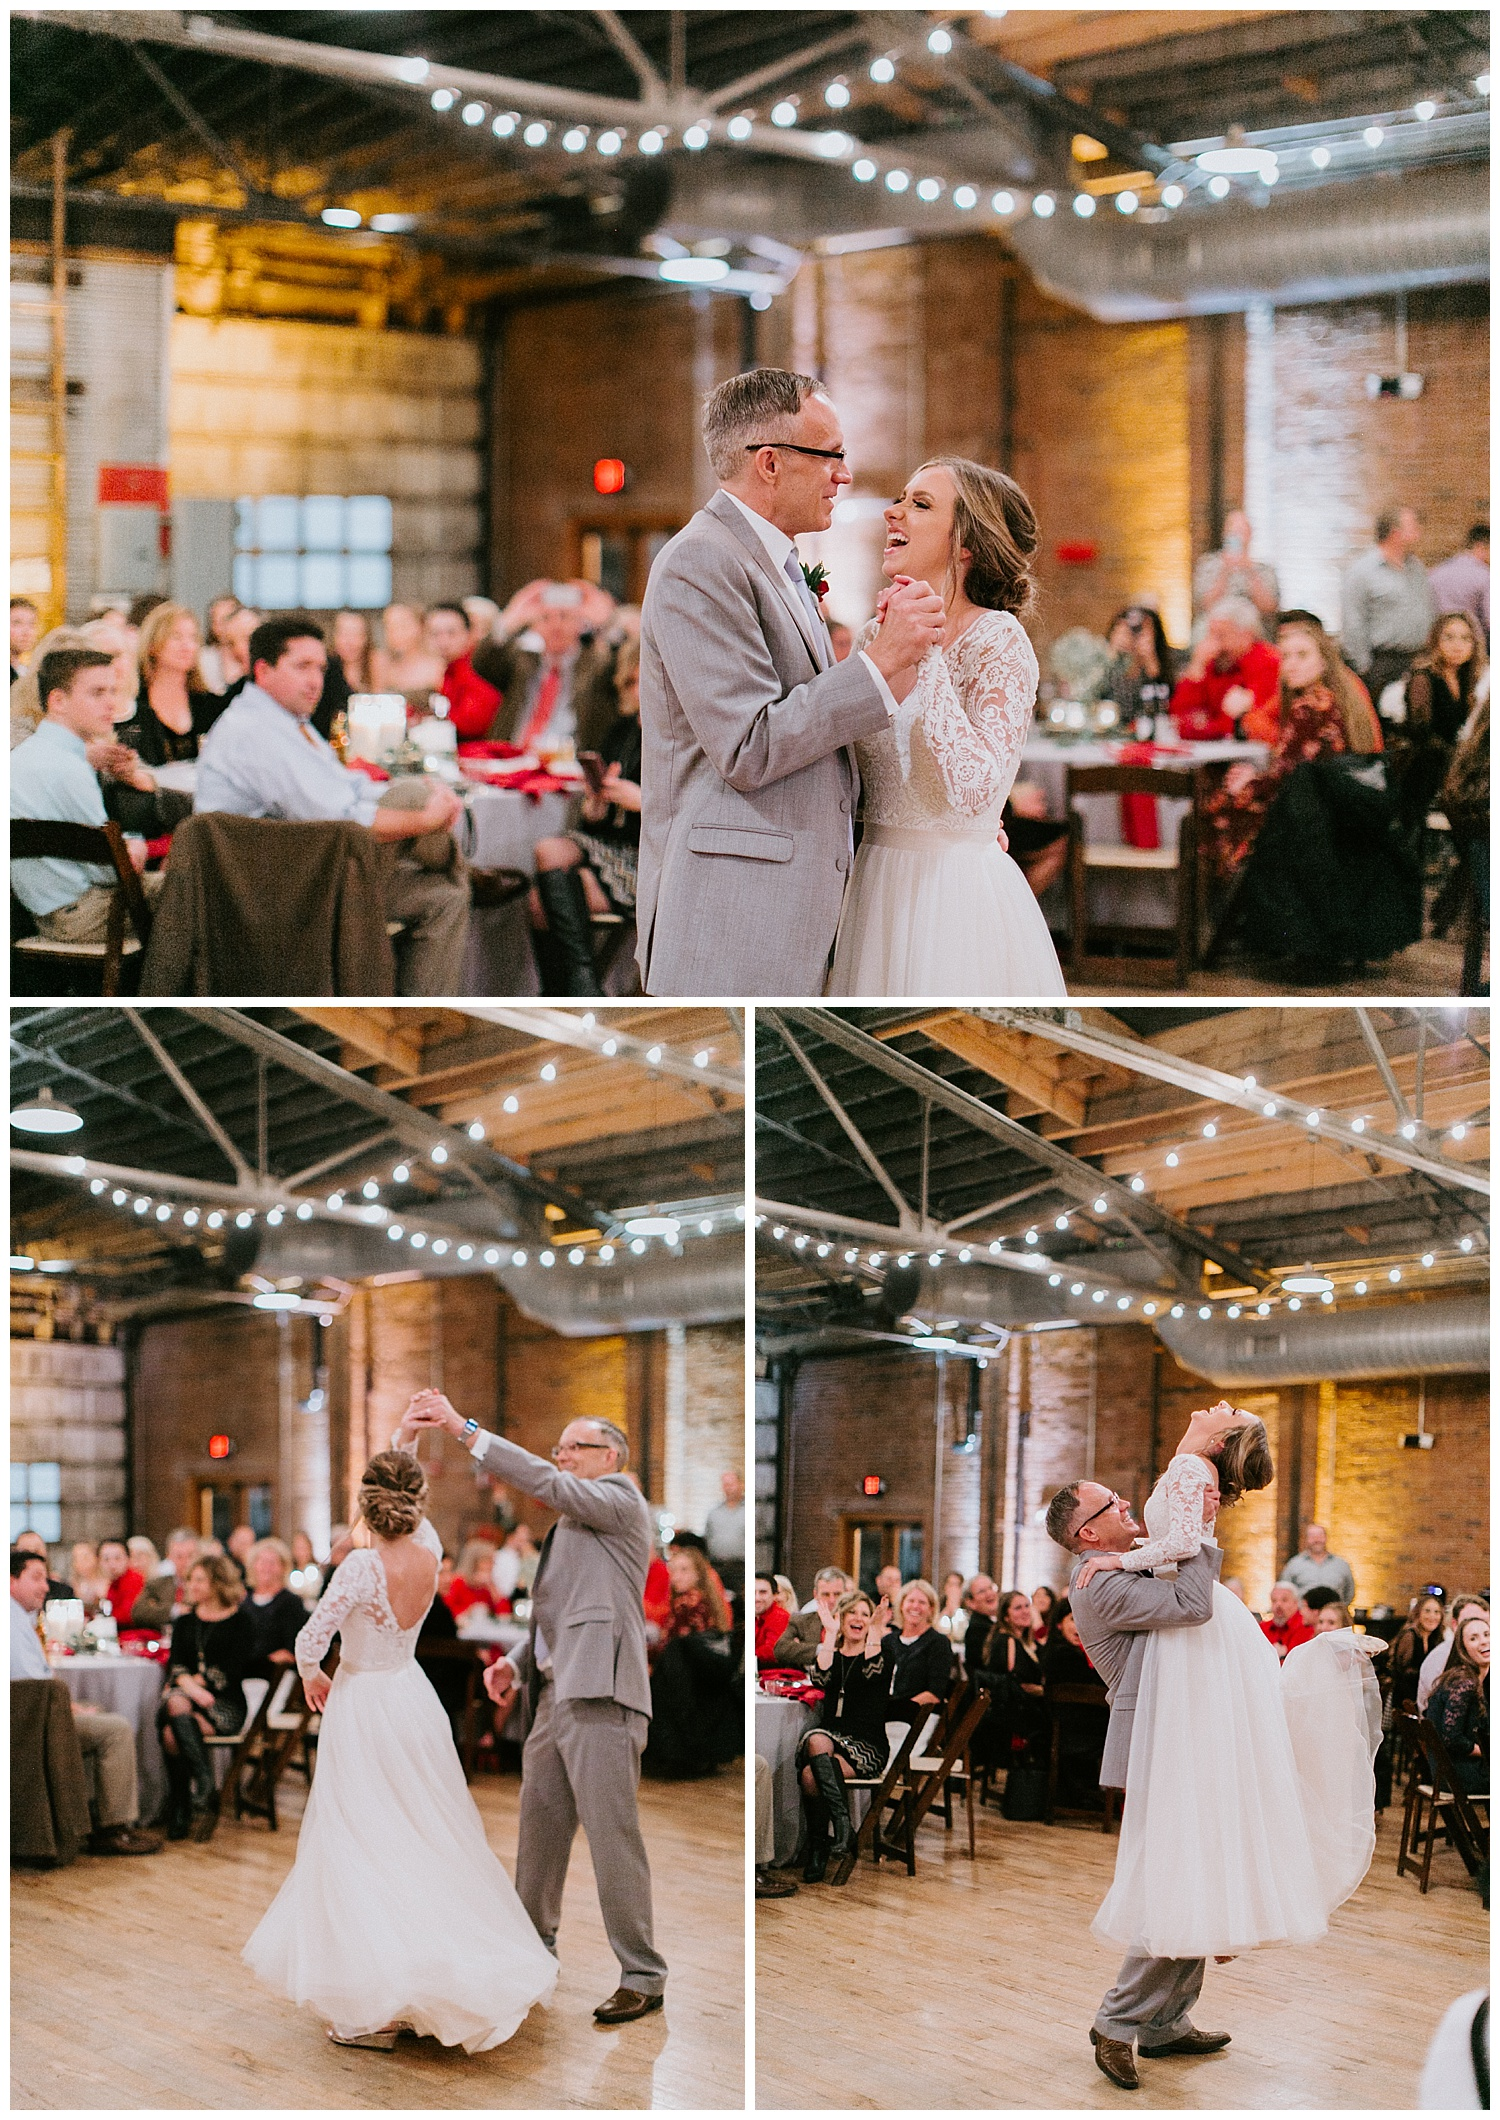 winter-wedding-the standard-knoxville_2019-01-23_0080.jpg